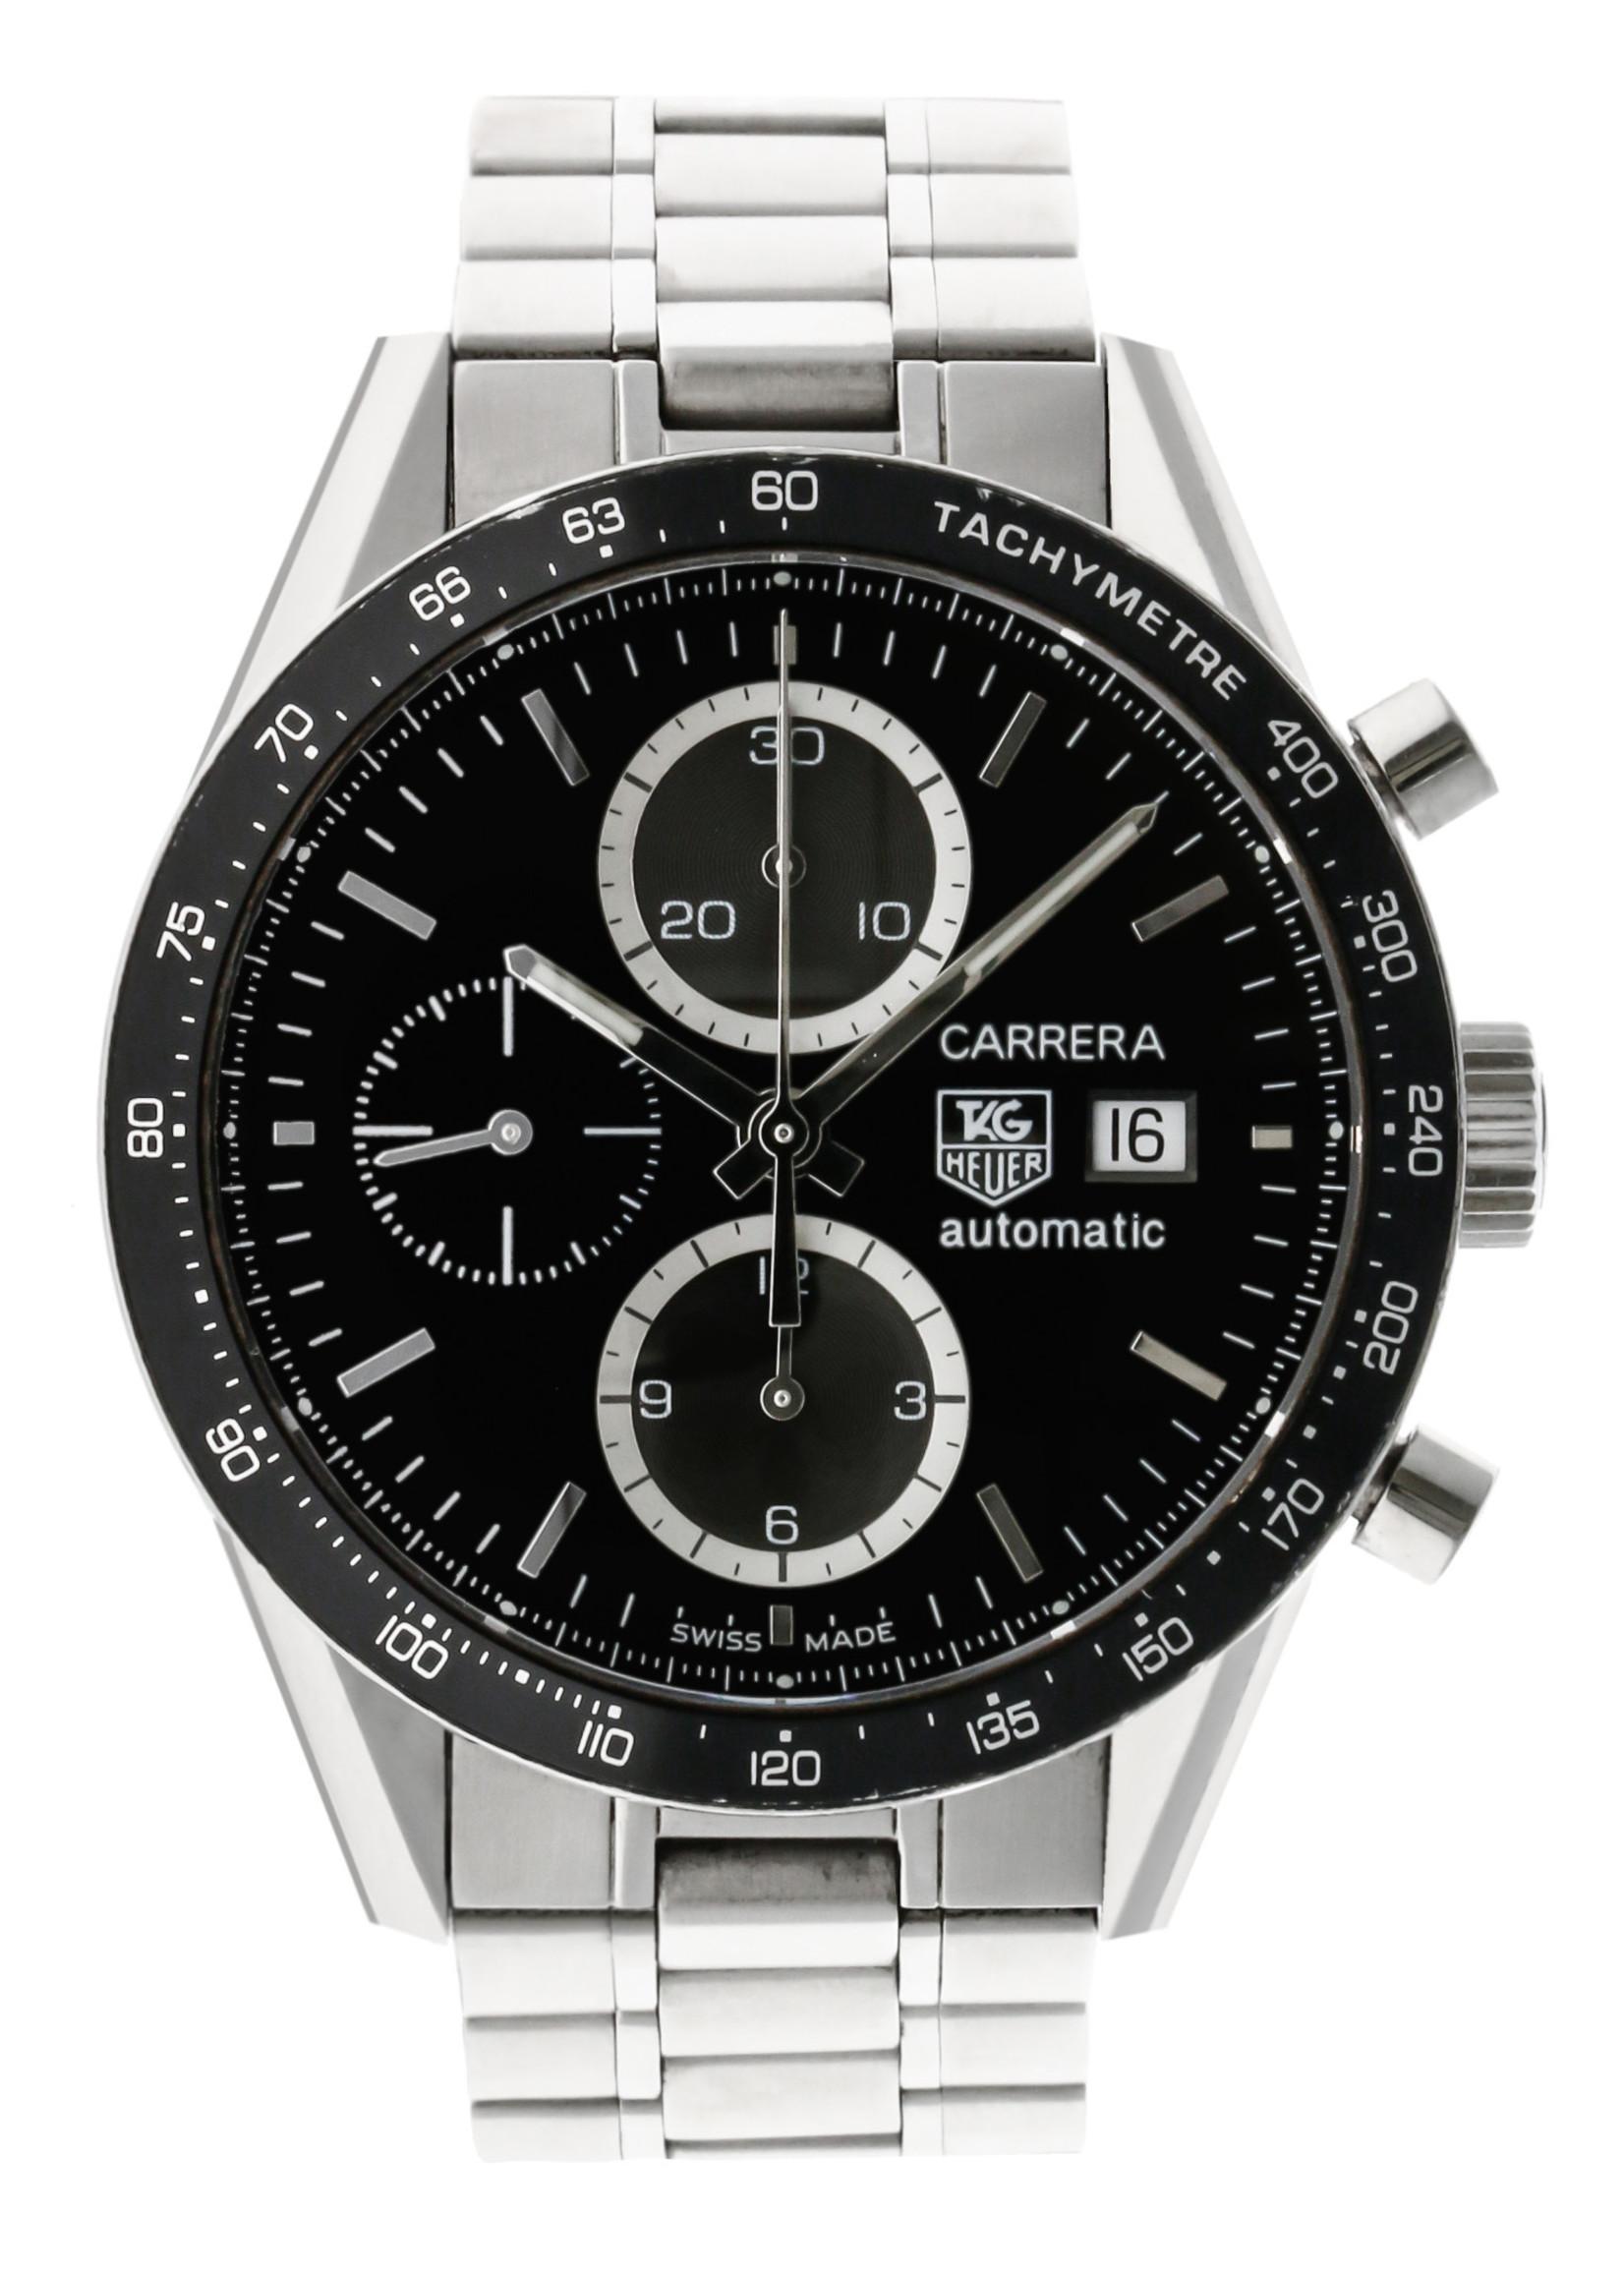 Tag Heuer Watches TAG HEUER CARRERA 41MM (2008 B+P) #CV2010.BA0794